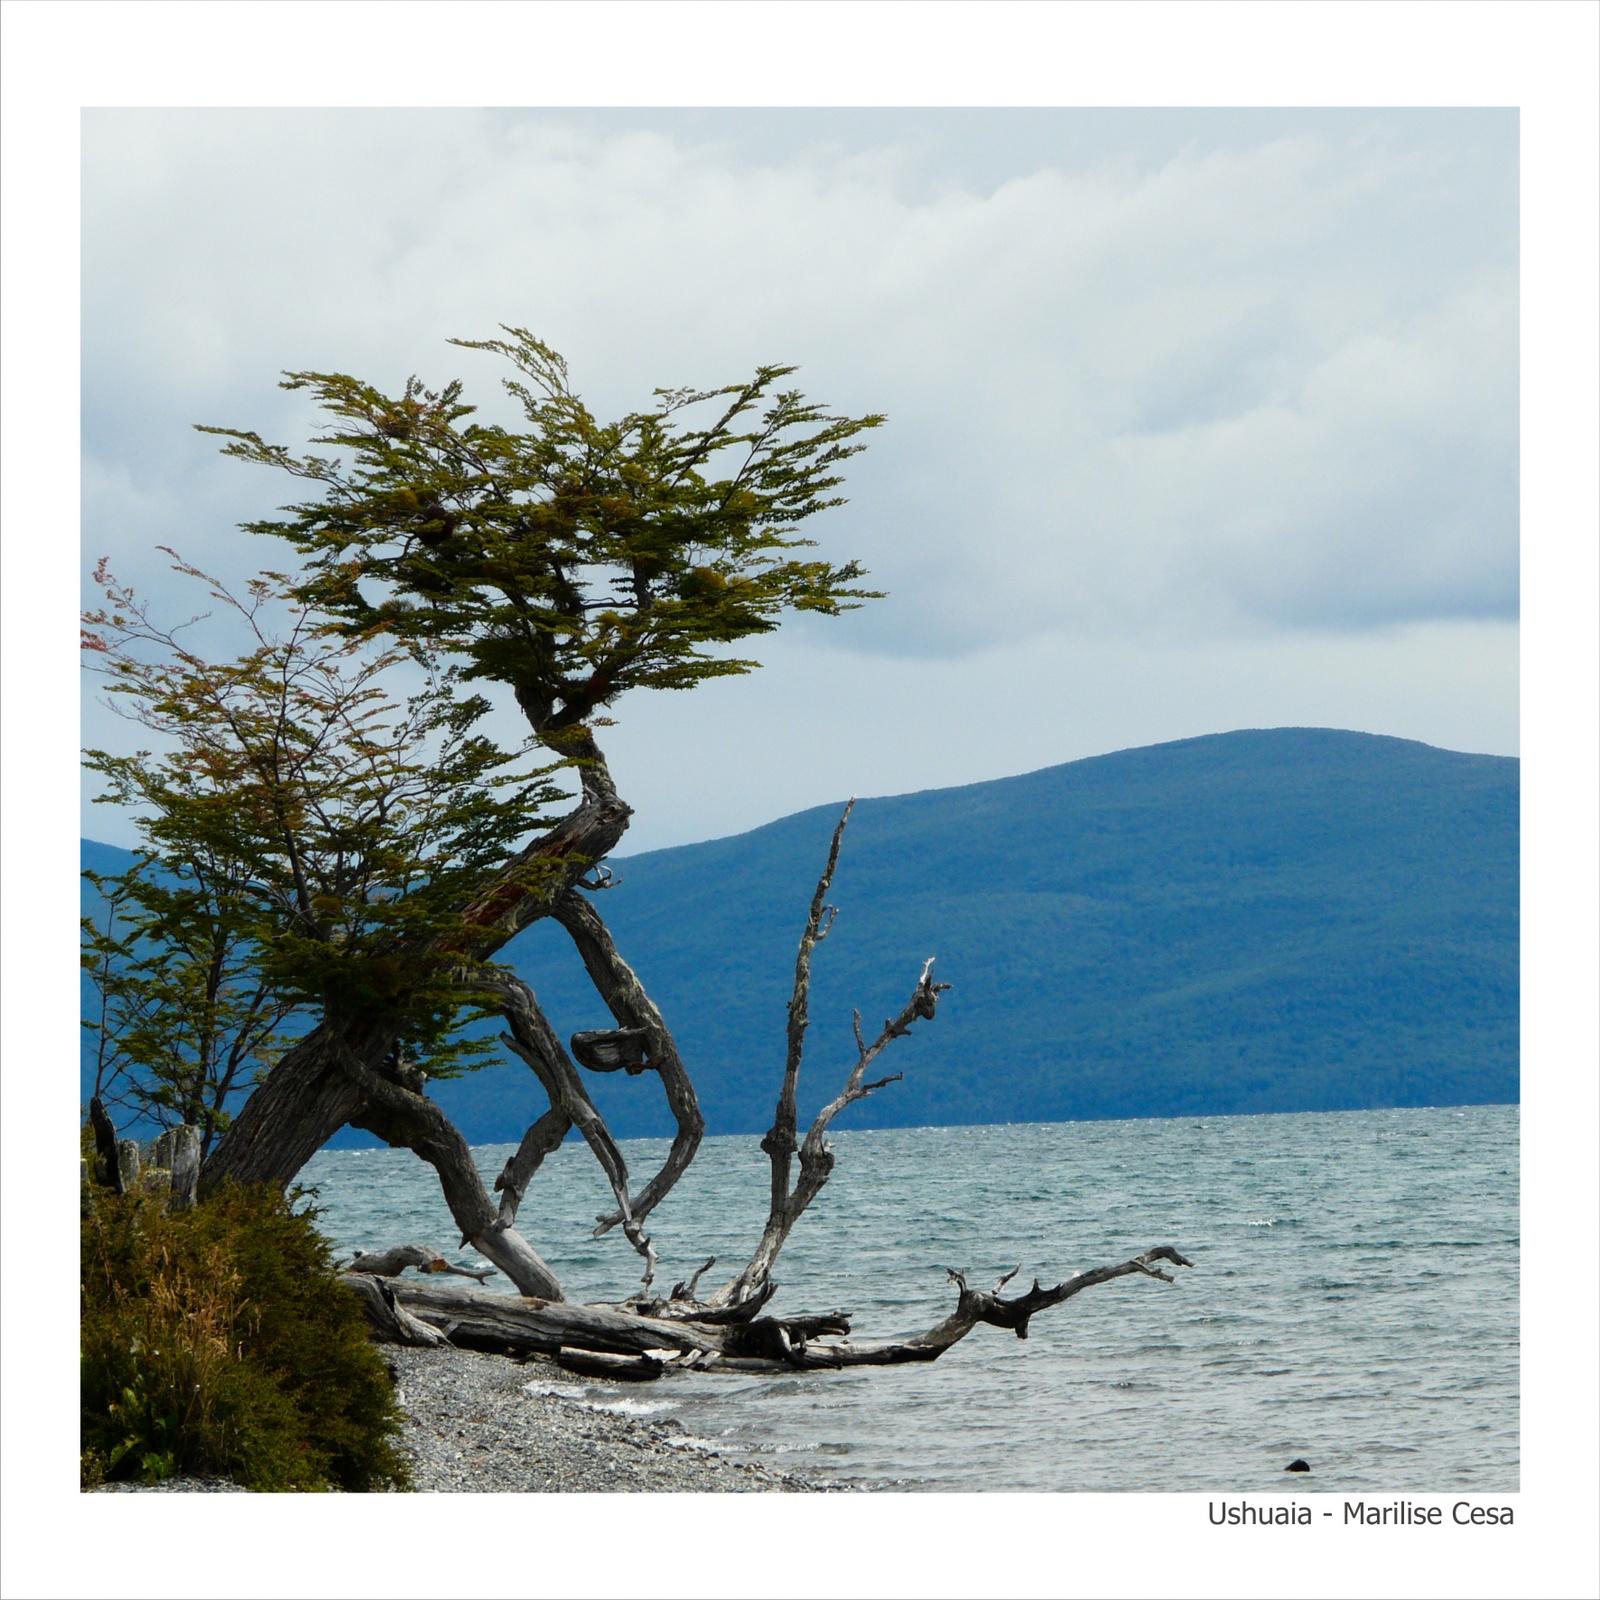 Ushuaia - Marilise Cesa - 30-30